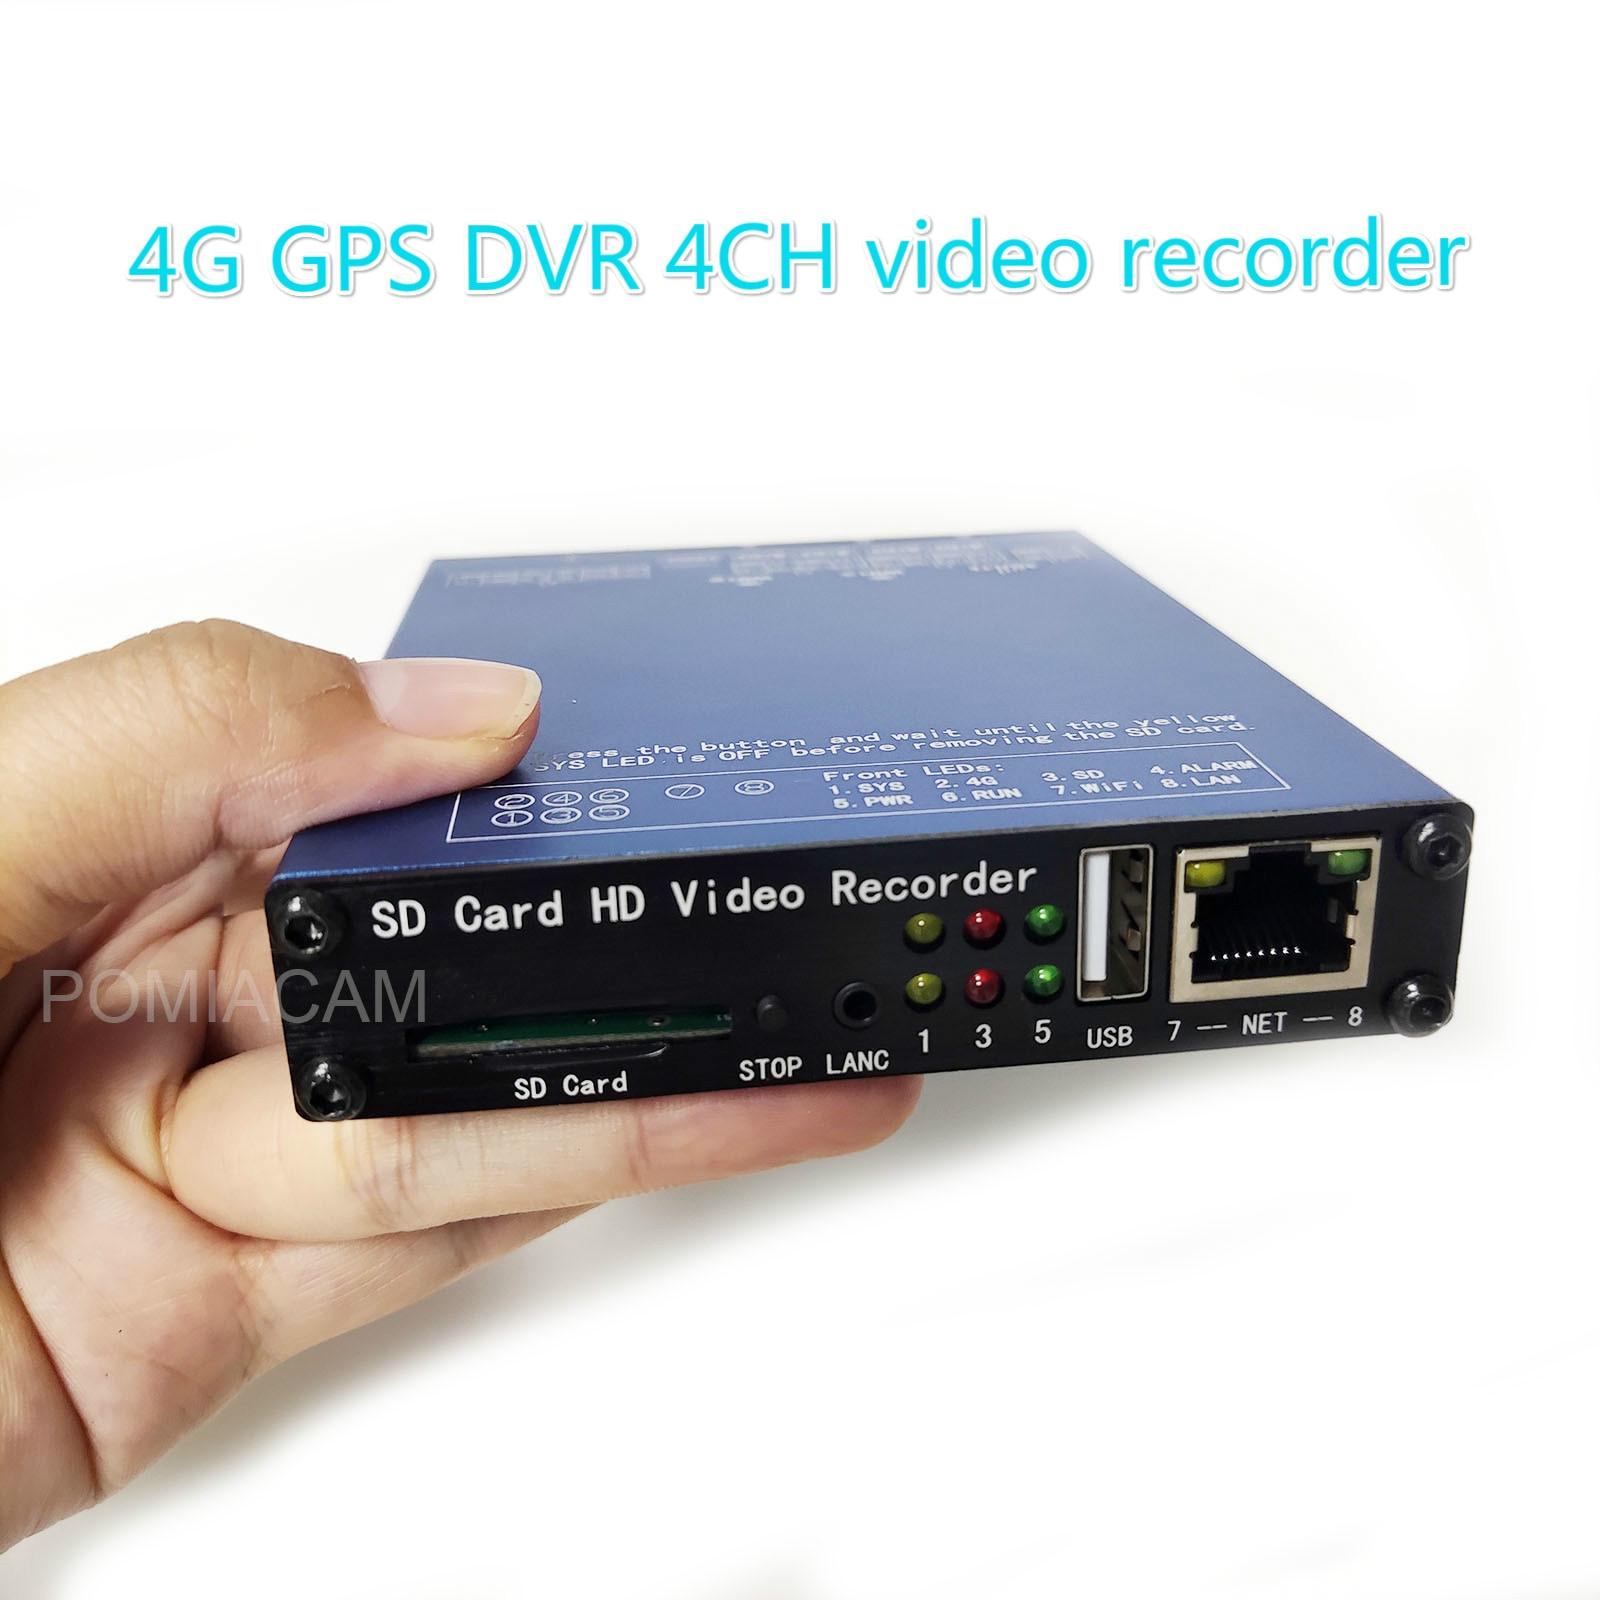 SDVR004Pro-كاميرا DVR صغيرة مزودة بكاميرا ، تسجيل فيديو ، WIFI ، 1080P ، شاشة كشف ، dvr في الوقت الفعلي ، لكاميرا BNC ، GPS ، WIFI ، 4G